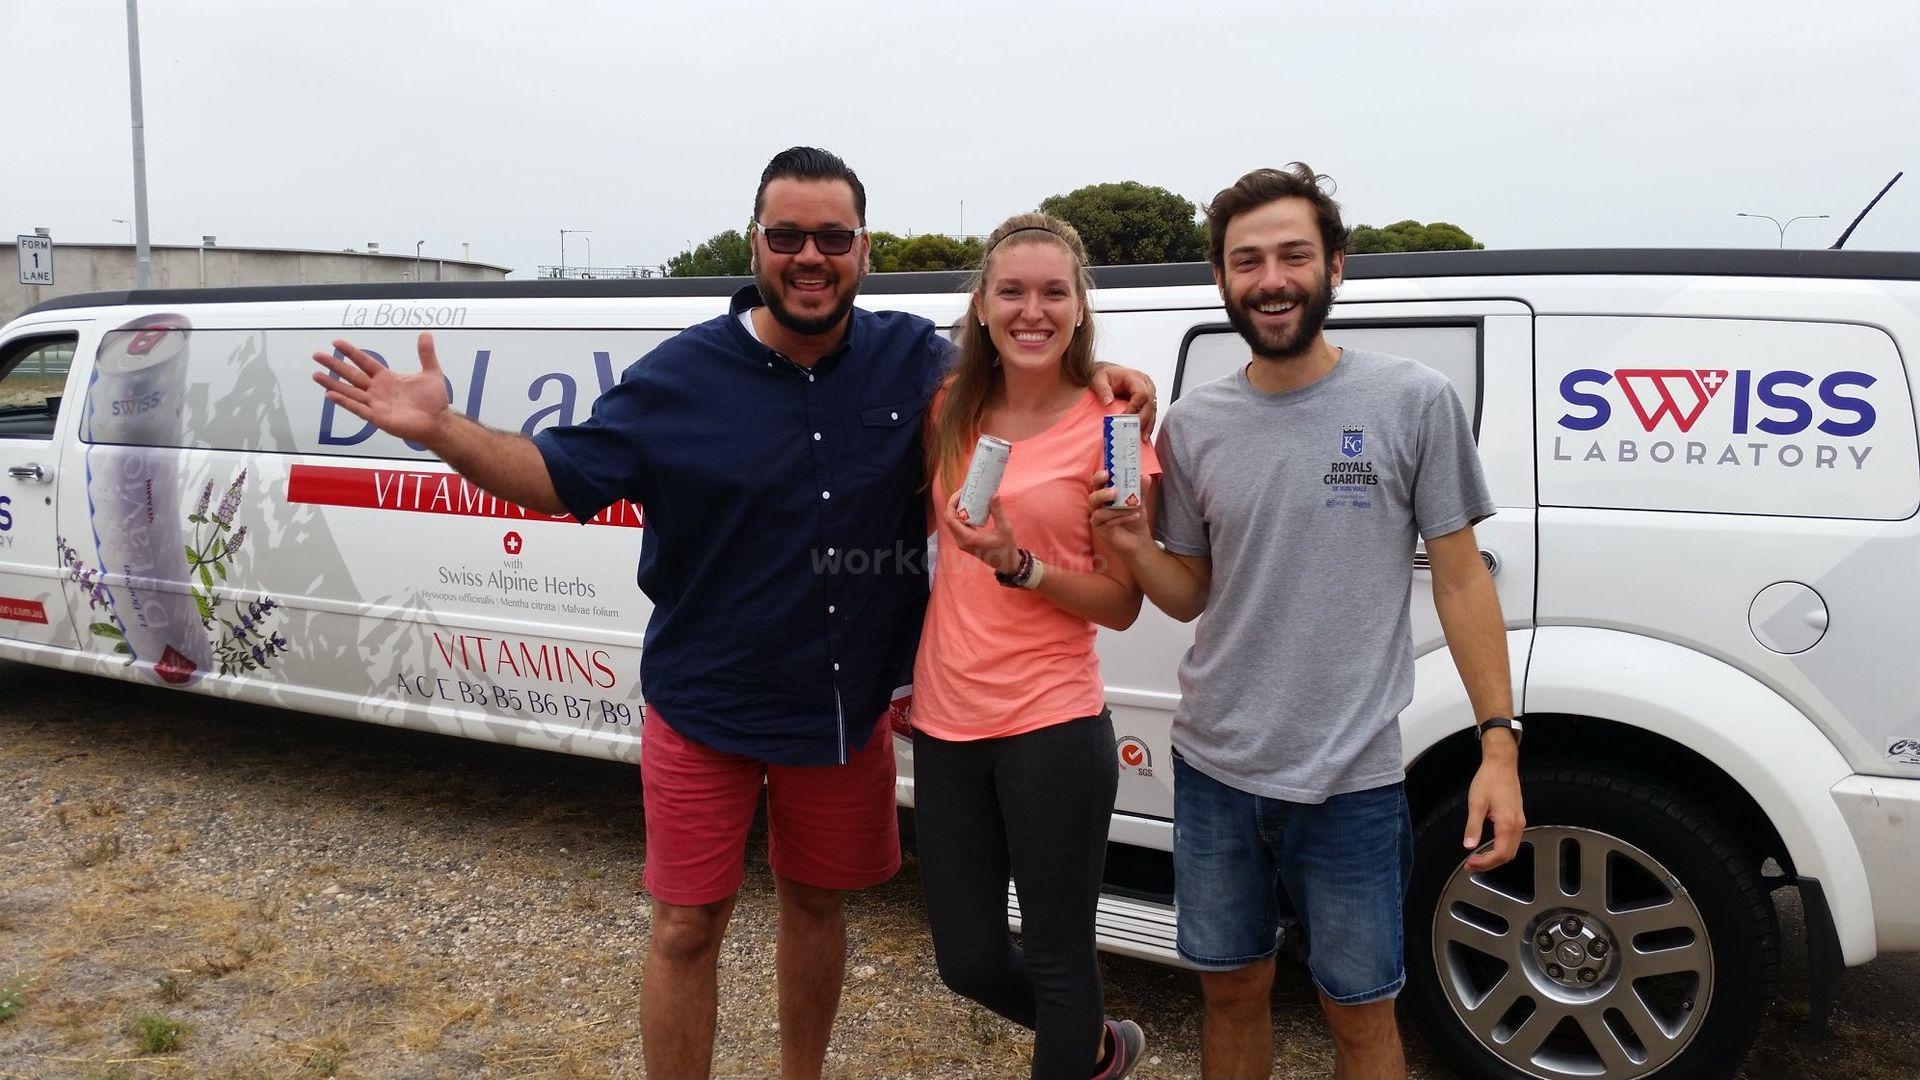 hitchhiker group travel explore adventure